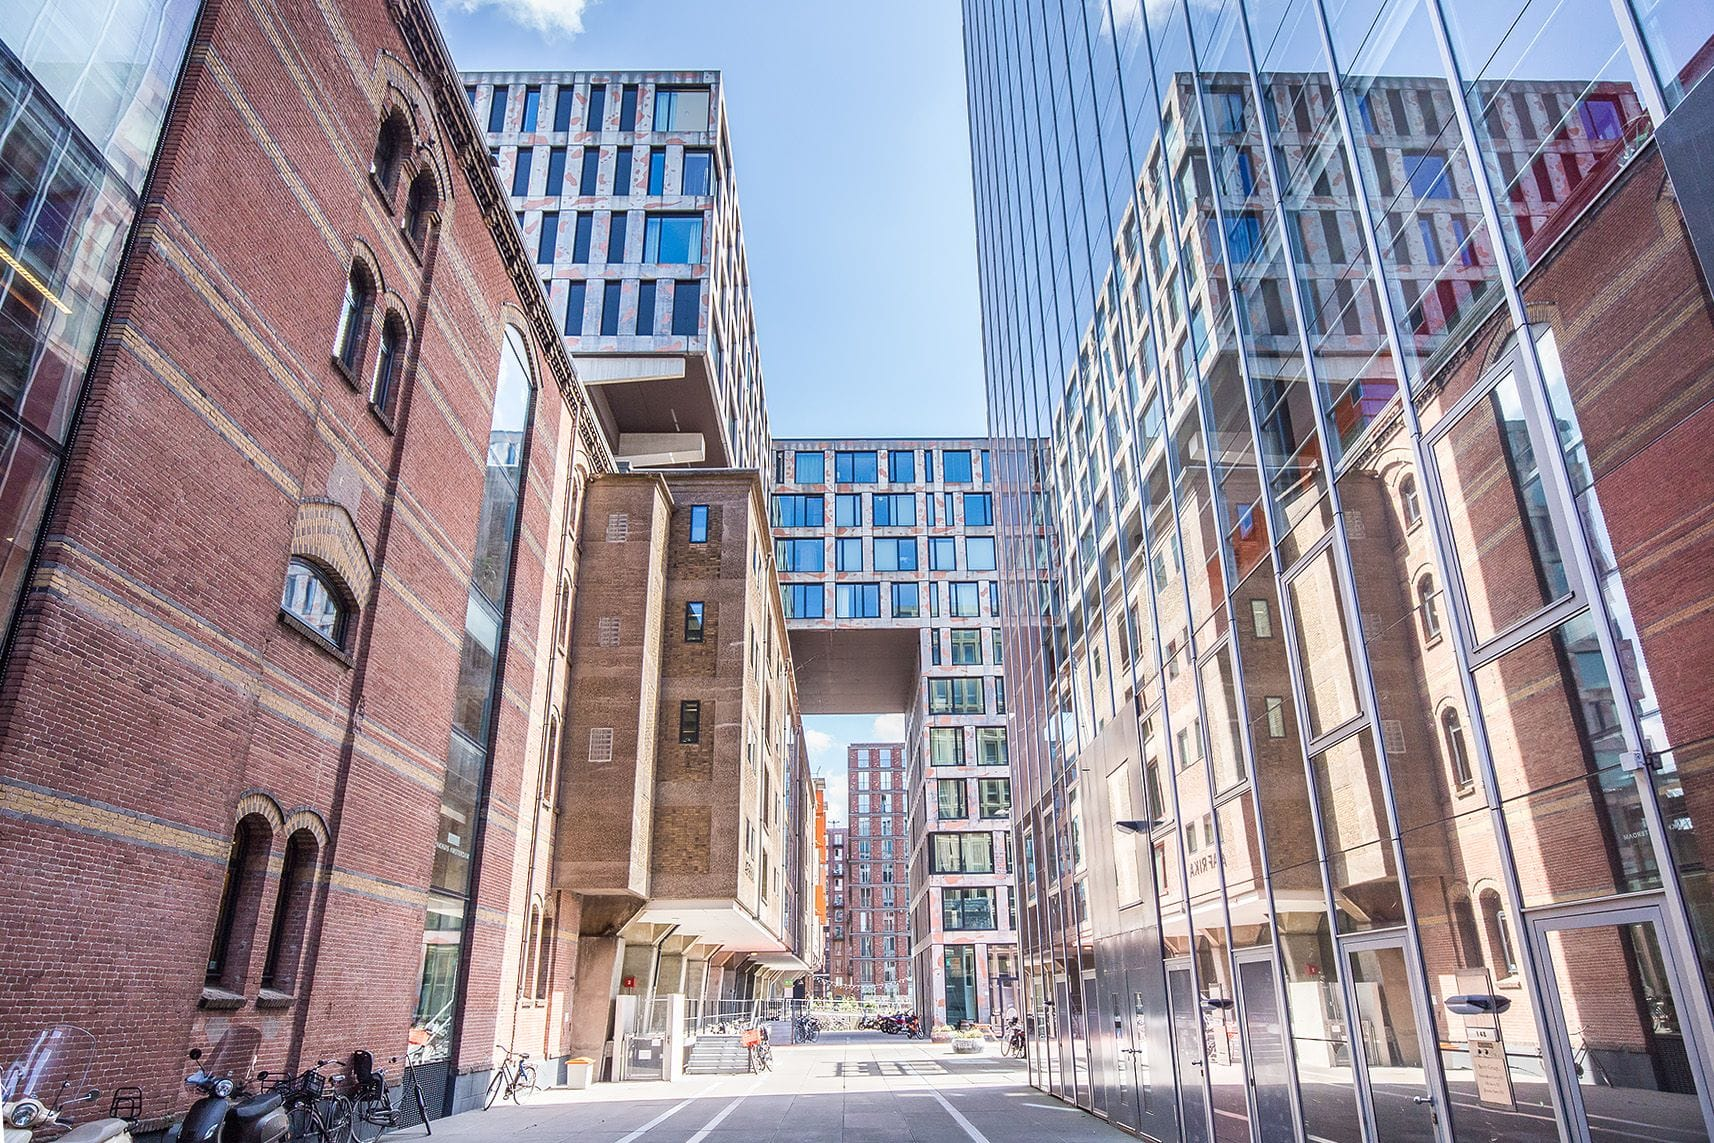 Kantoor Ymere Amsterdam